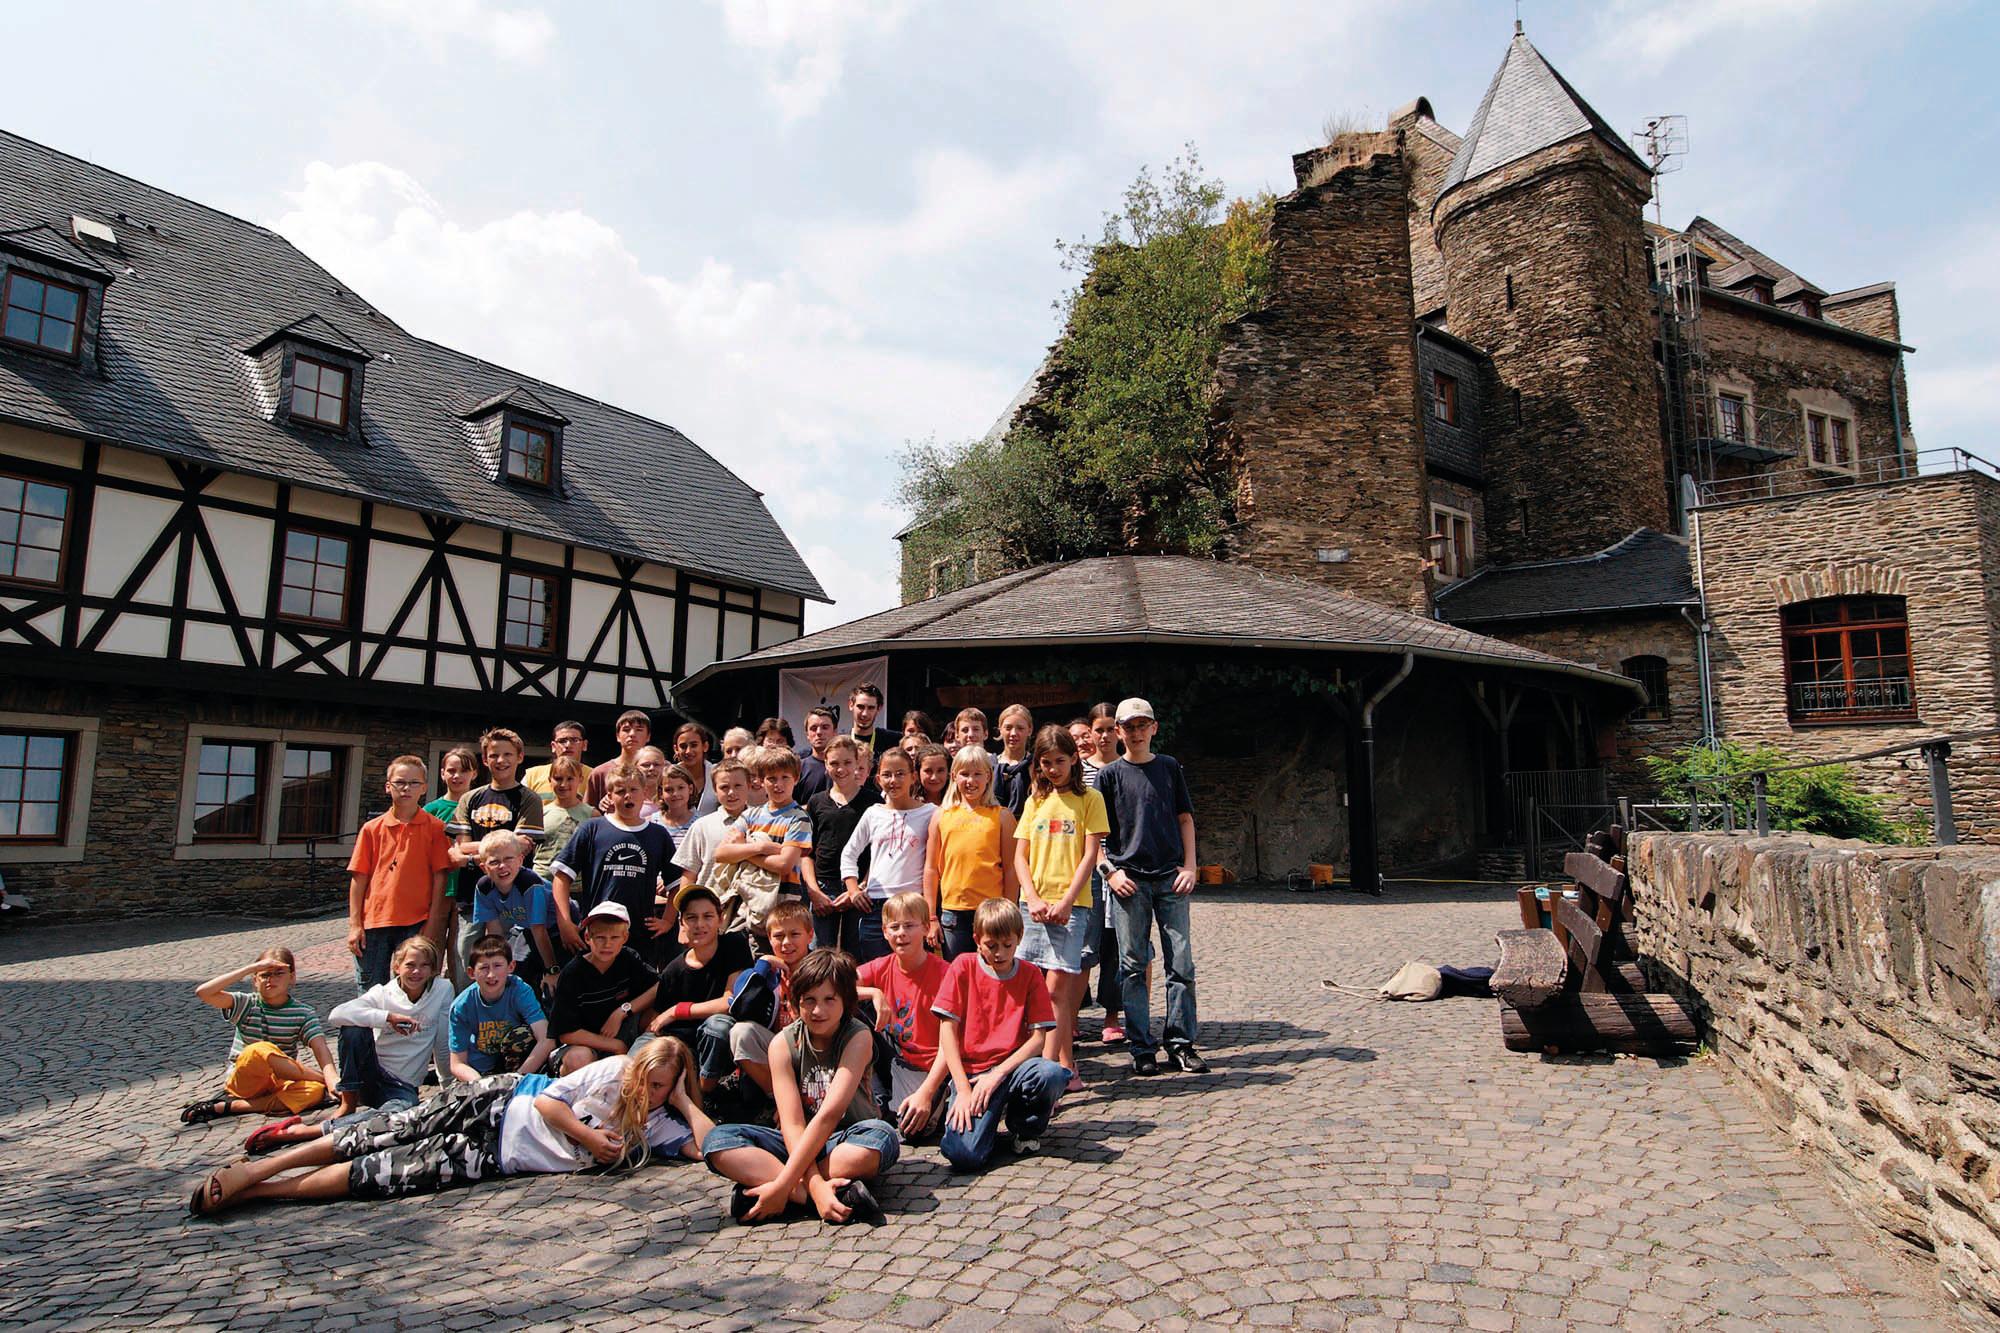 oberwesel-courtyard-2